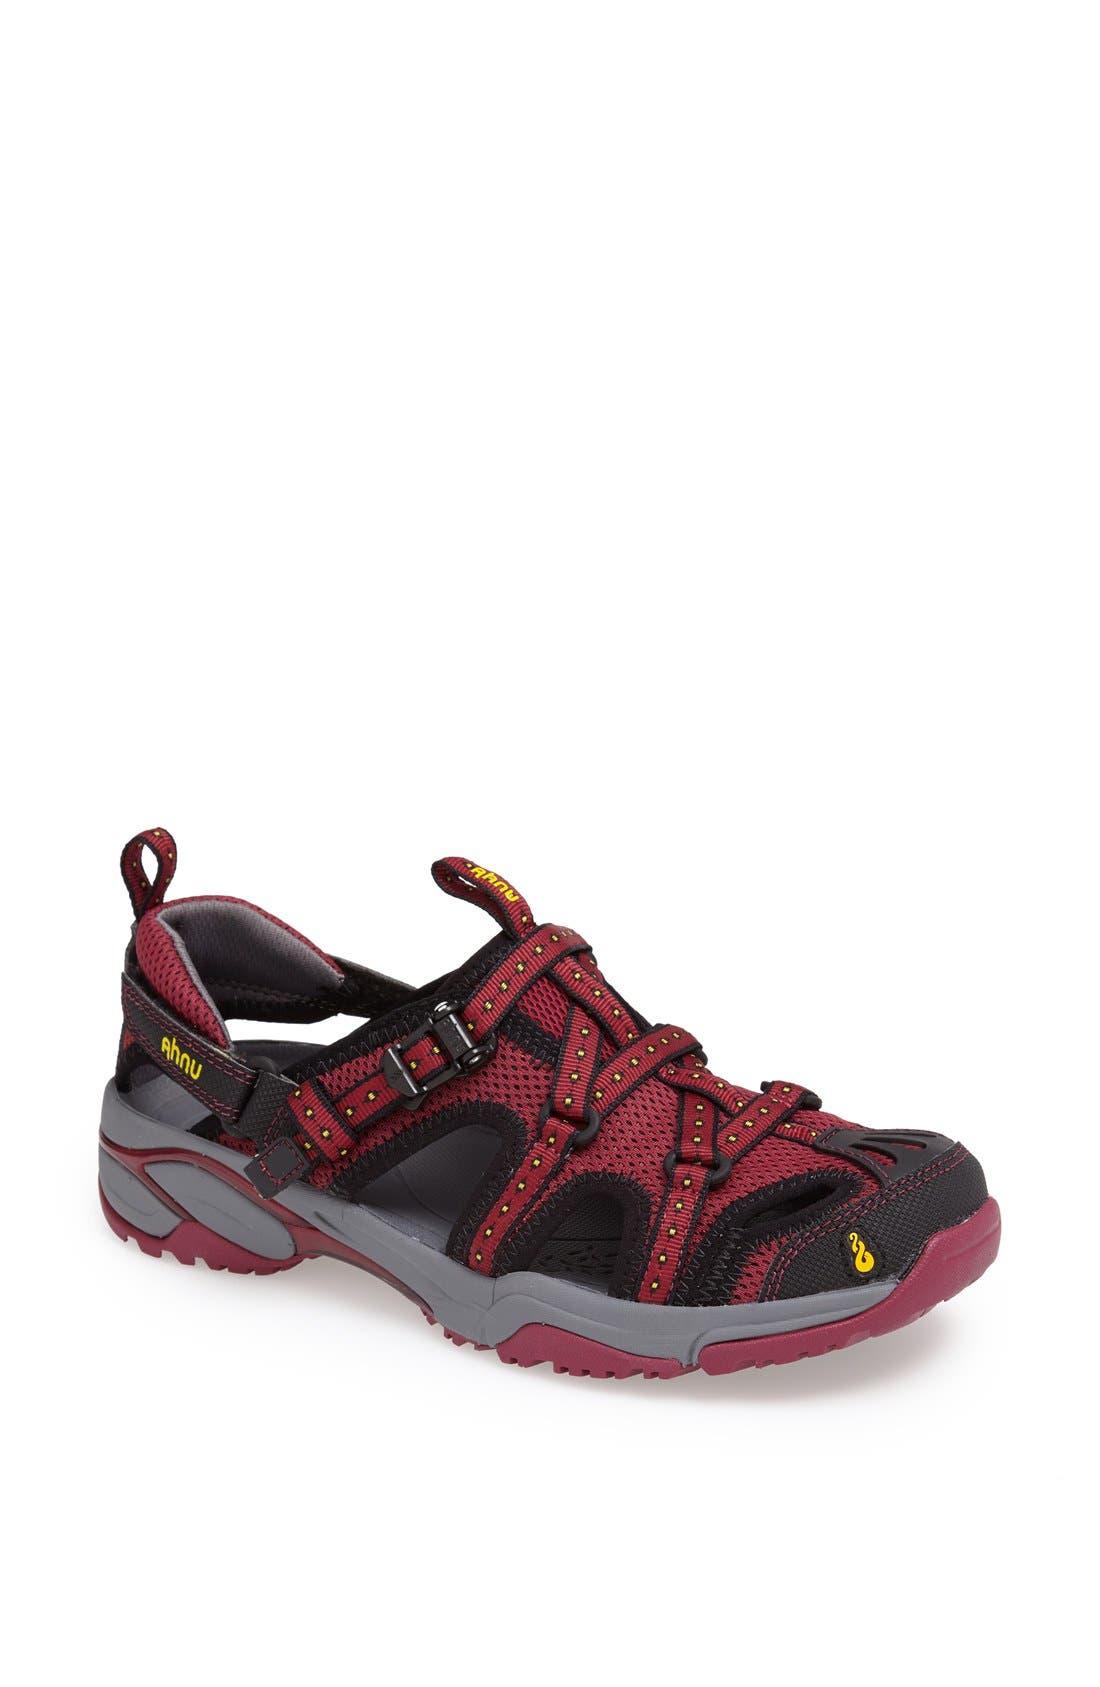 Main Image - Ahnu 'Tilden IV' Sport Sandal